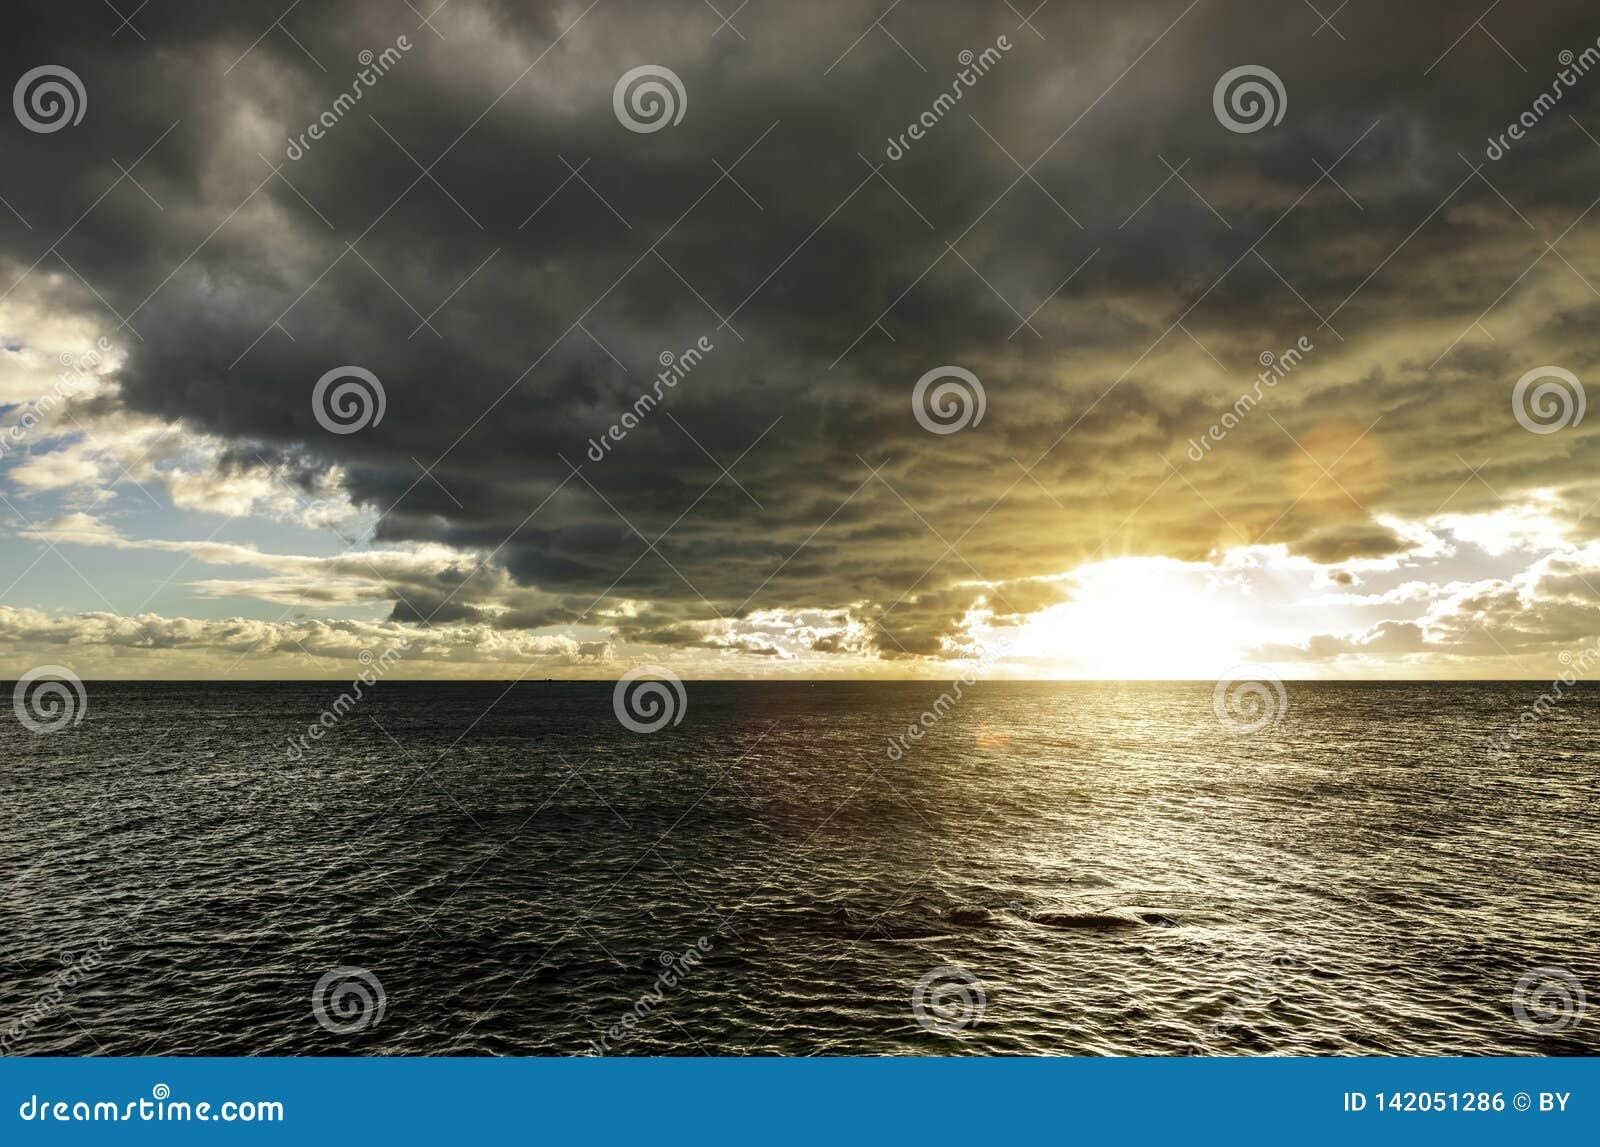 Dark Clouds over The Sea